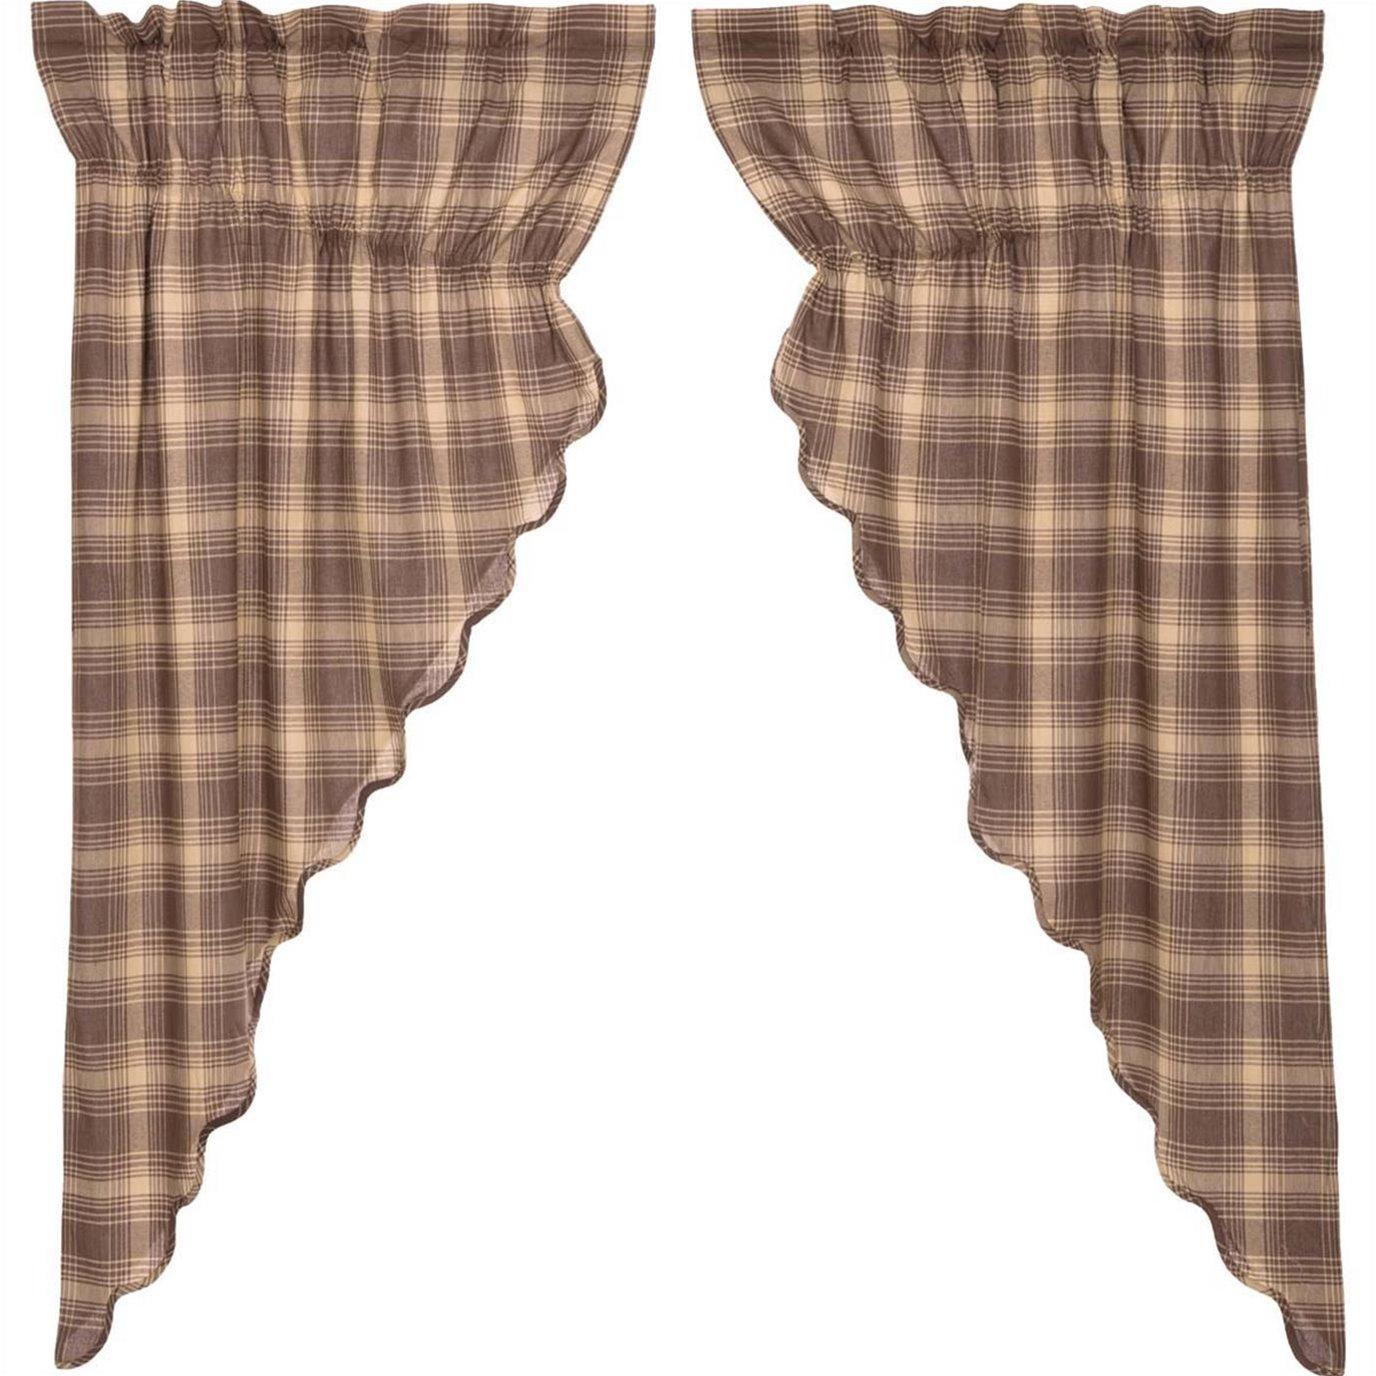 Dawson Star Scalloped Prairie Short Panel Set of 2 63x36x18